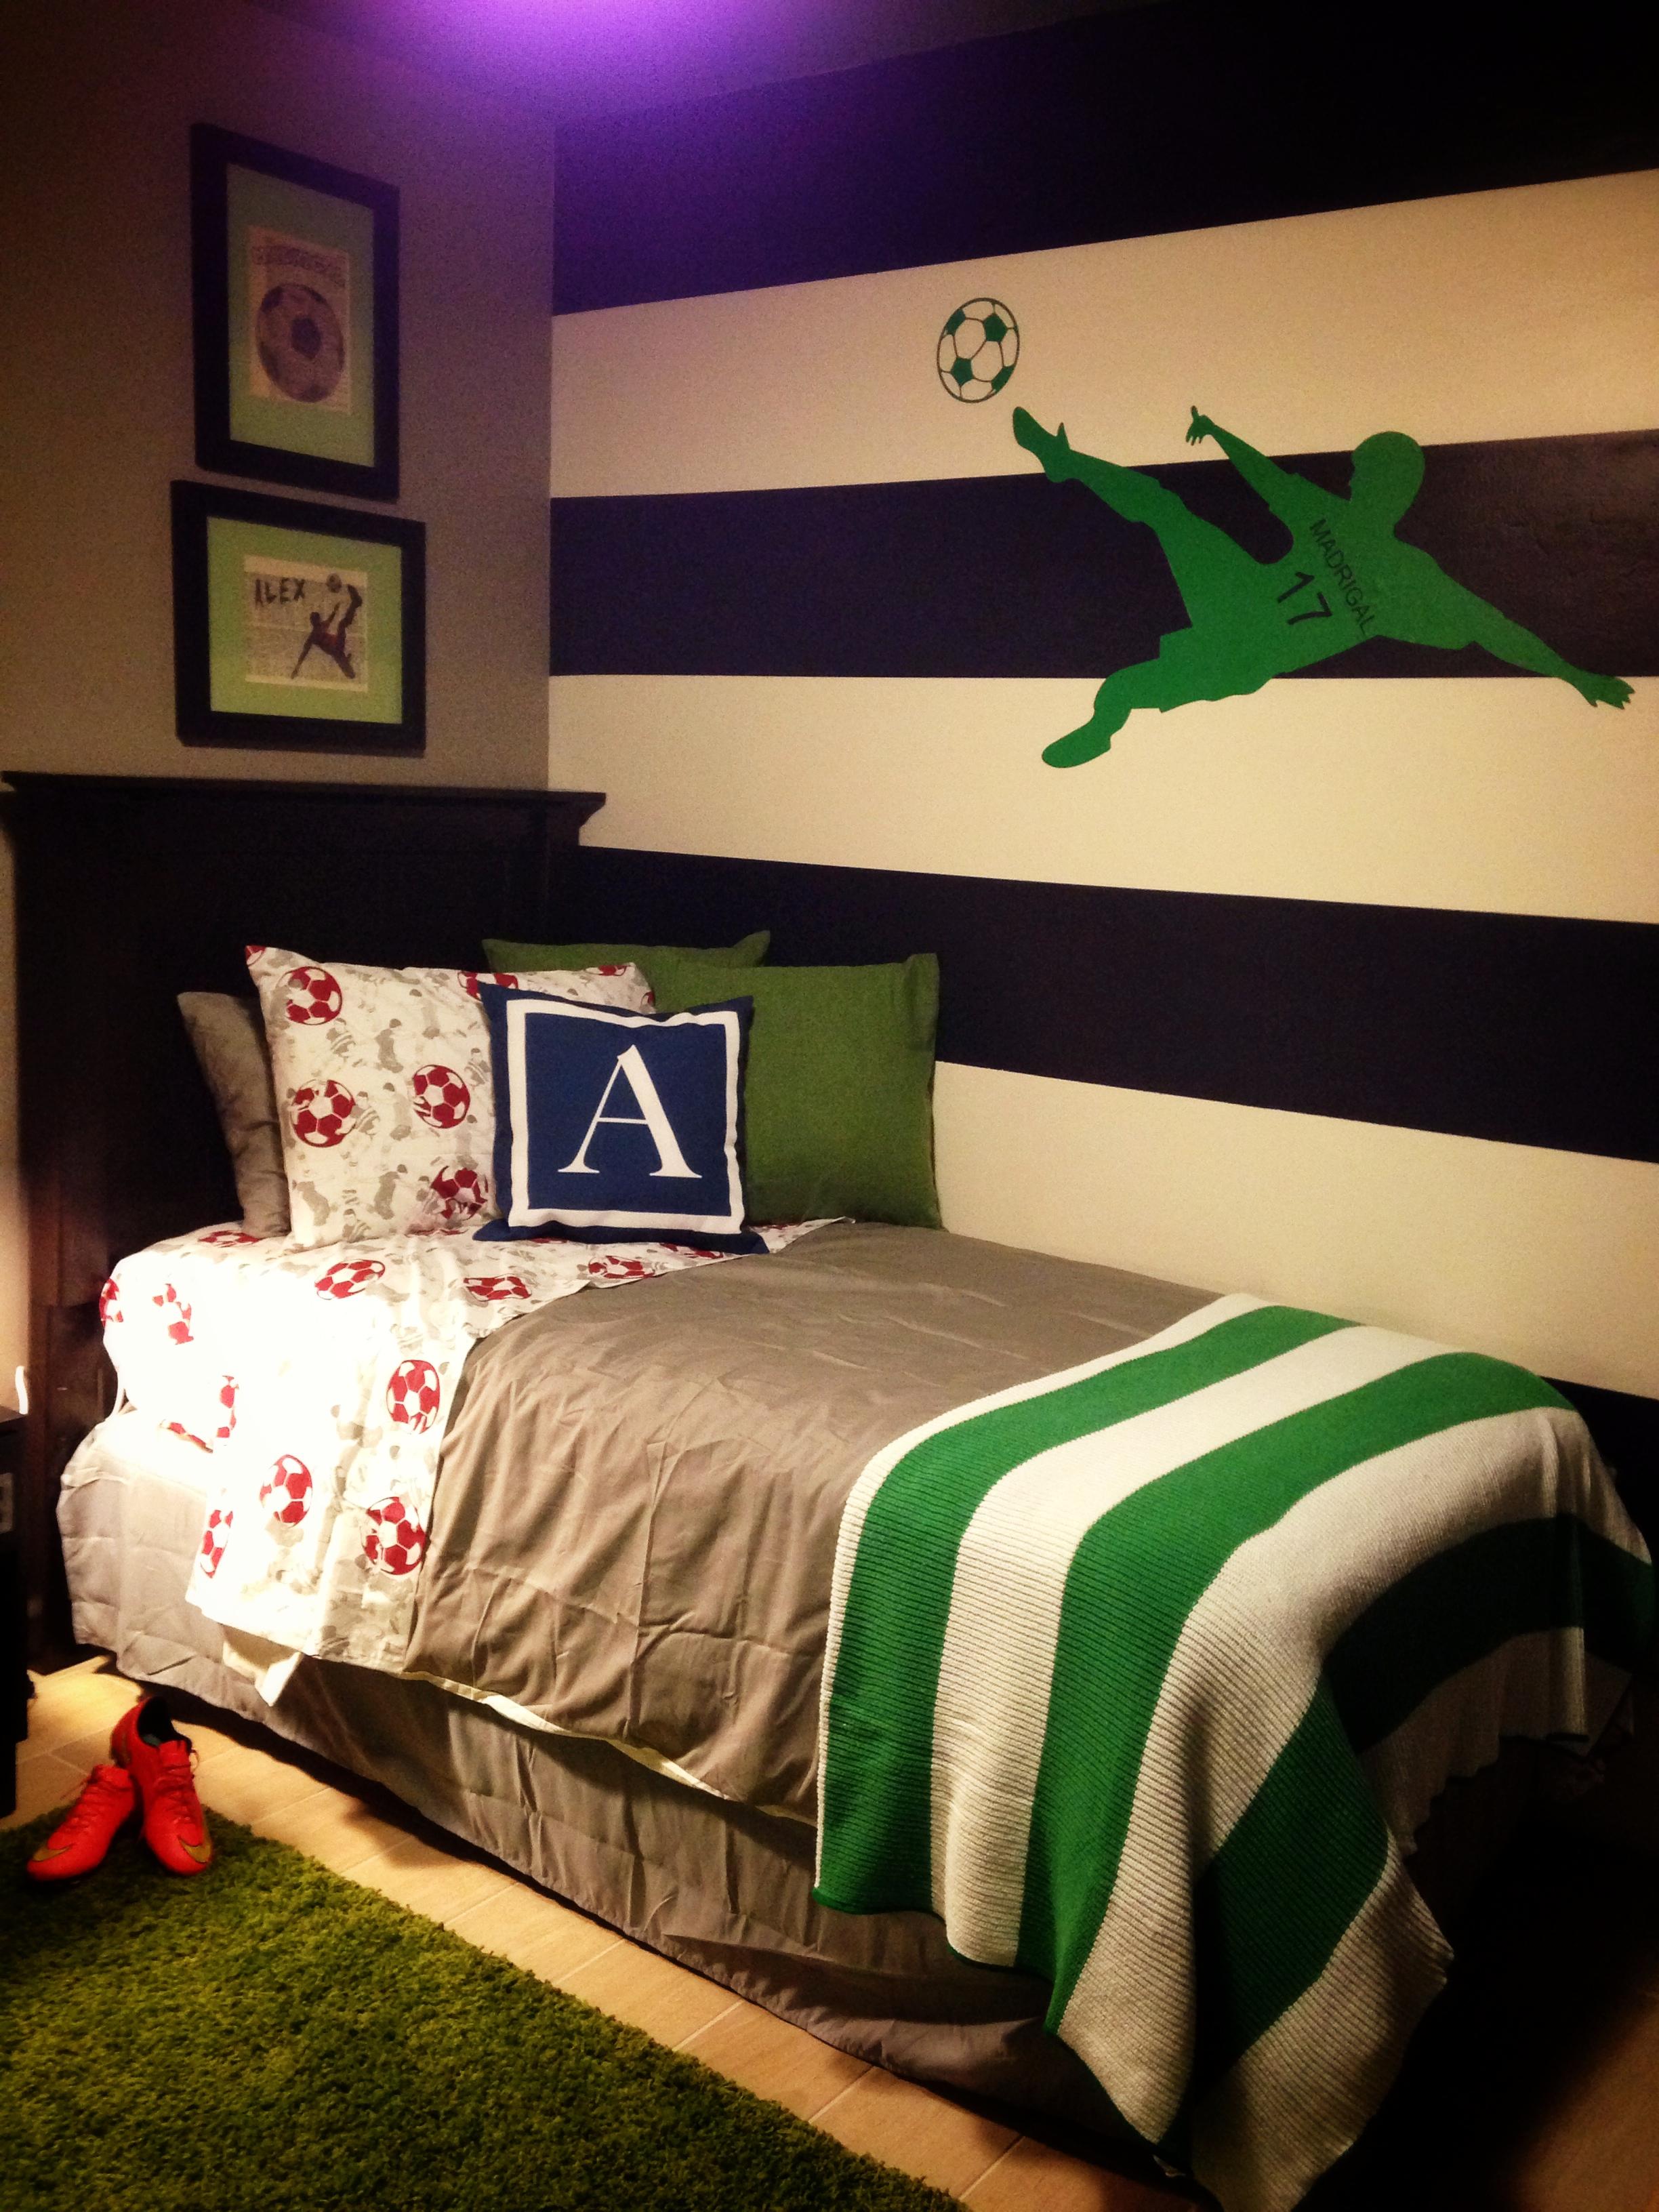 Boys Soccer Bedroom  Project Nursery